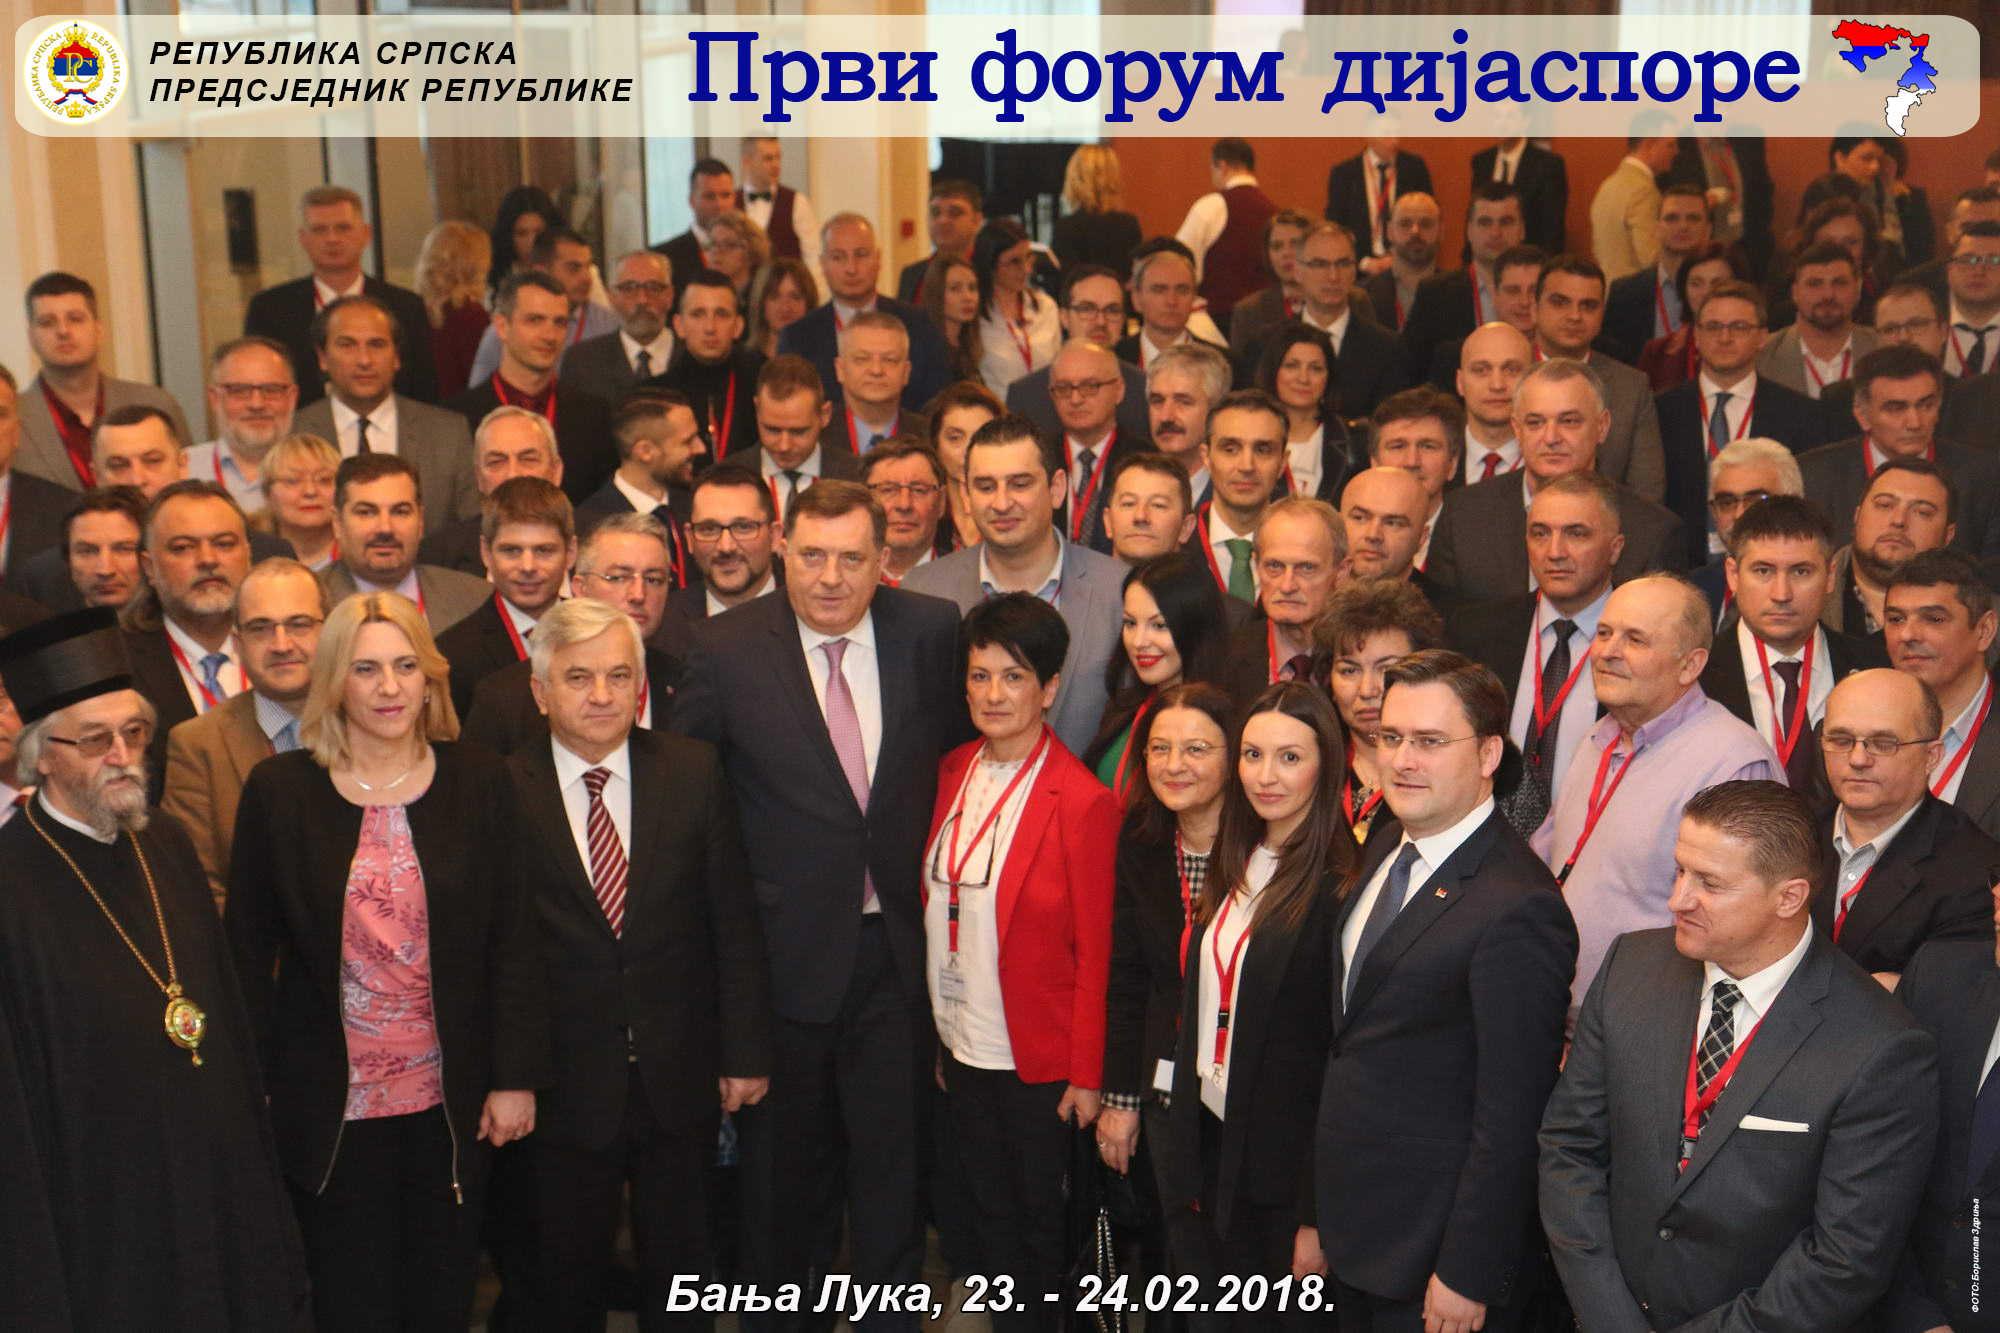 2018-02-23-i-24_prvi-forum-dijaspore_133_zipaphoto_borislav-zdrinja